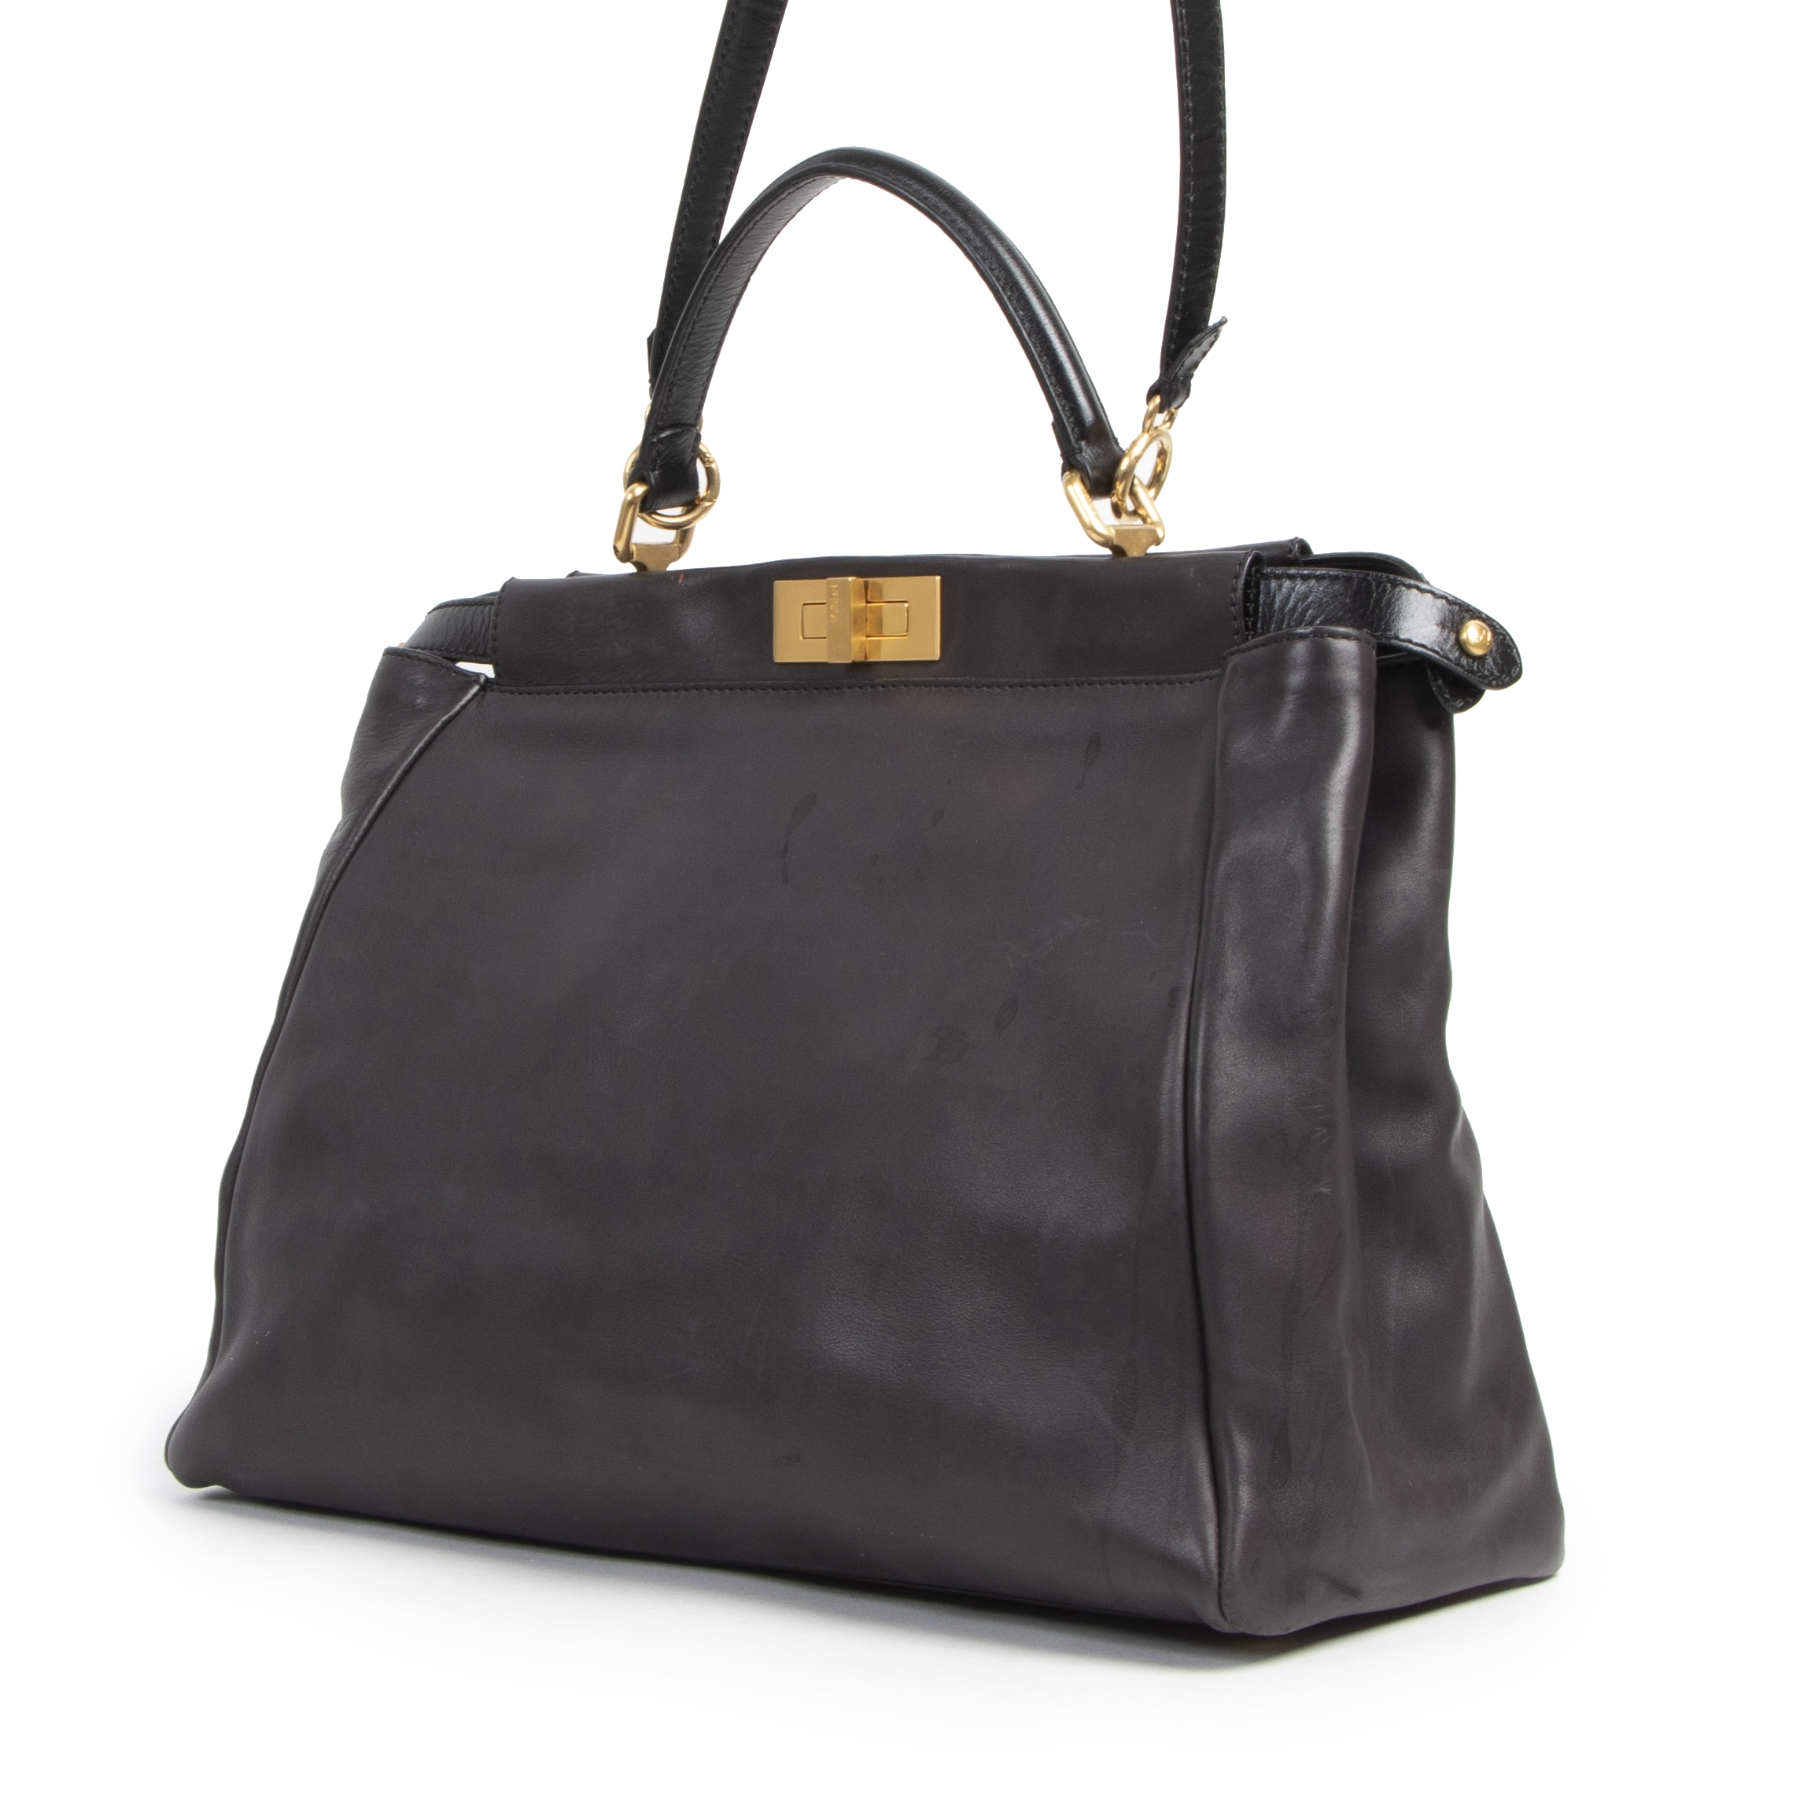 We buy and sell your authentic designer Fendi Peekaboo Large Black Lambskin Handbag